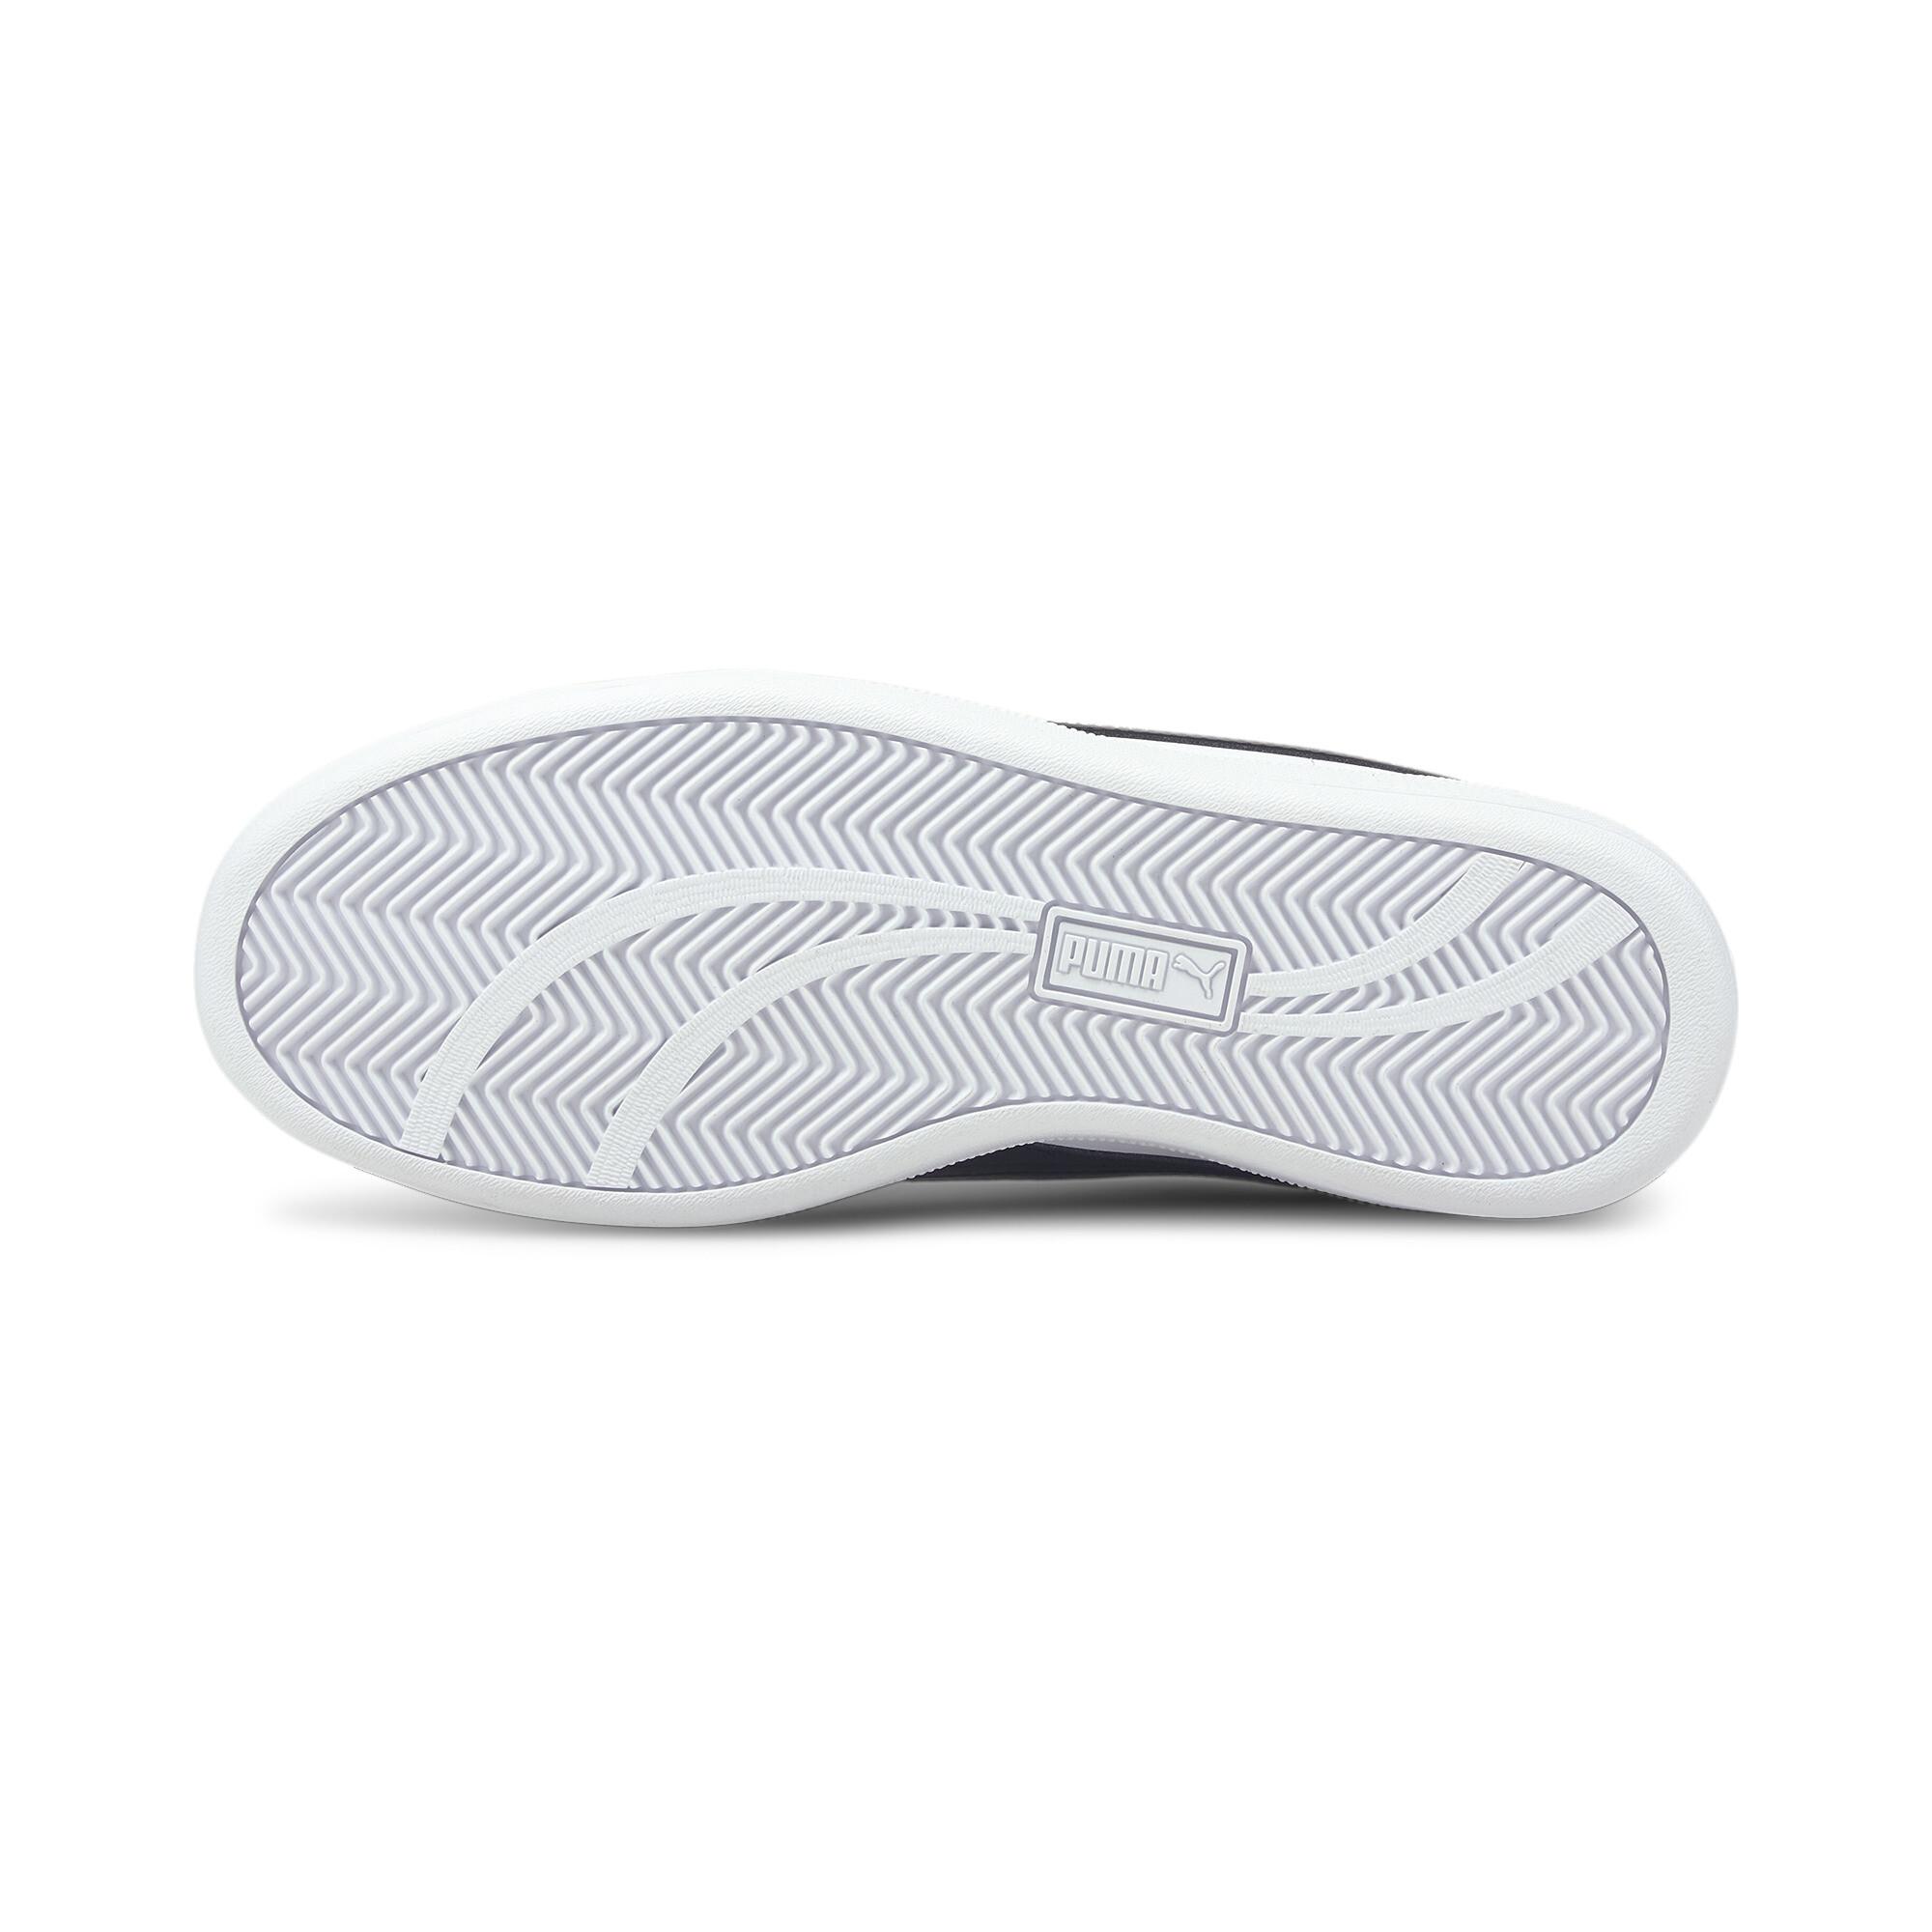 Indexbild 10 - PUMA Smash Trainers Schuhe Sneakers Sport Classics Unisex Neu